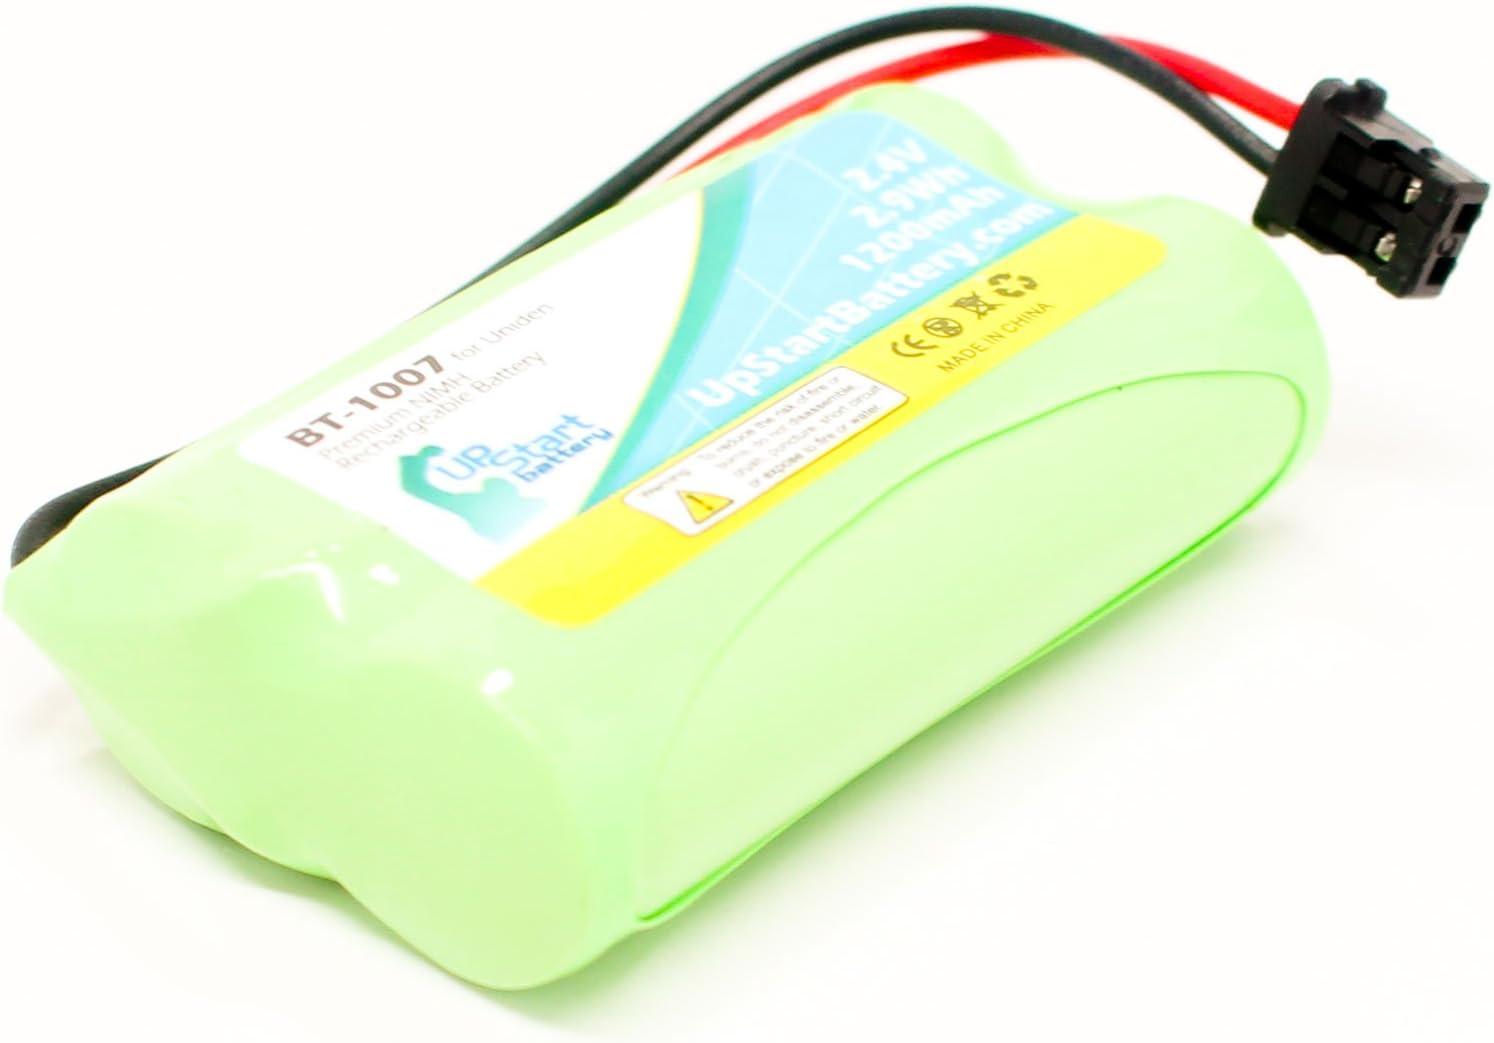 Uniden DECT1480–2–Batería de repuesto para UNIDEN BT-1007Teléfono inalámbrico recargable (1200mAh, 2,4V, Ni-MH)